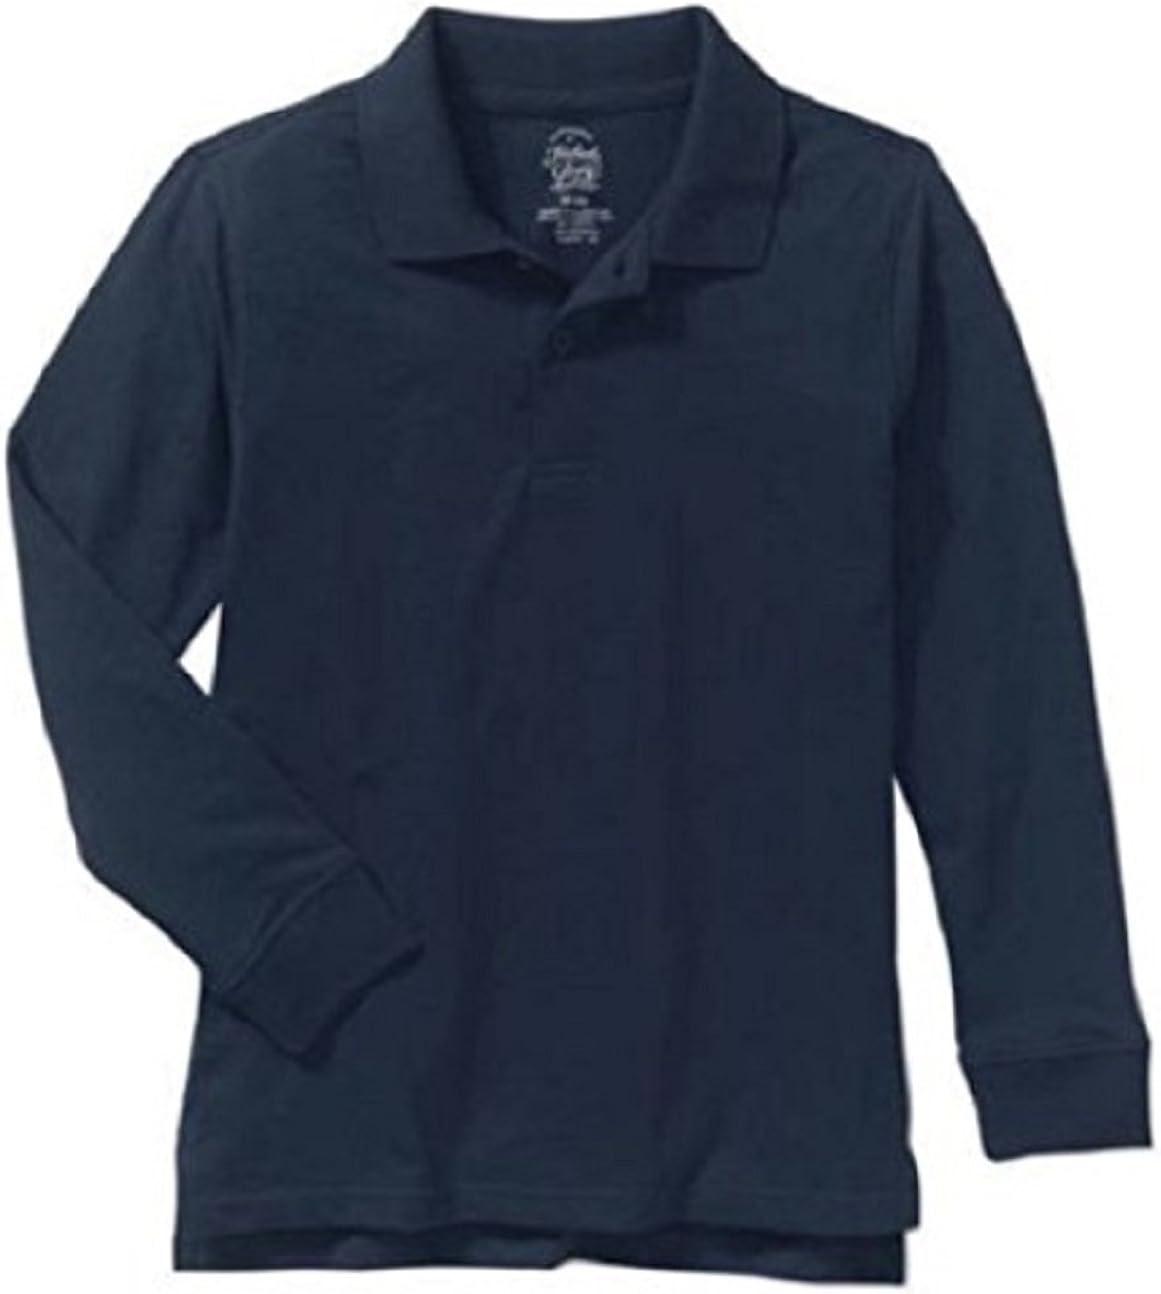 Faded Glory Boys Long Sleeve Navy Blue Cotton Polo Shirts